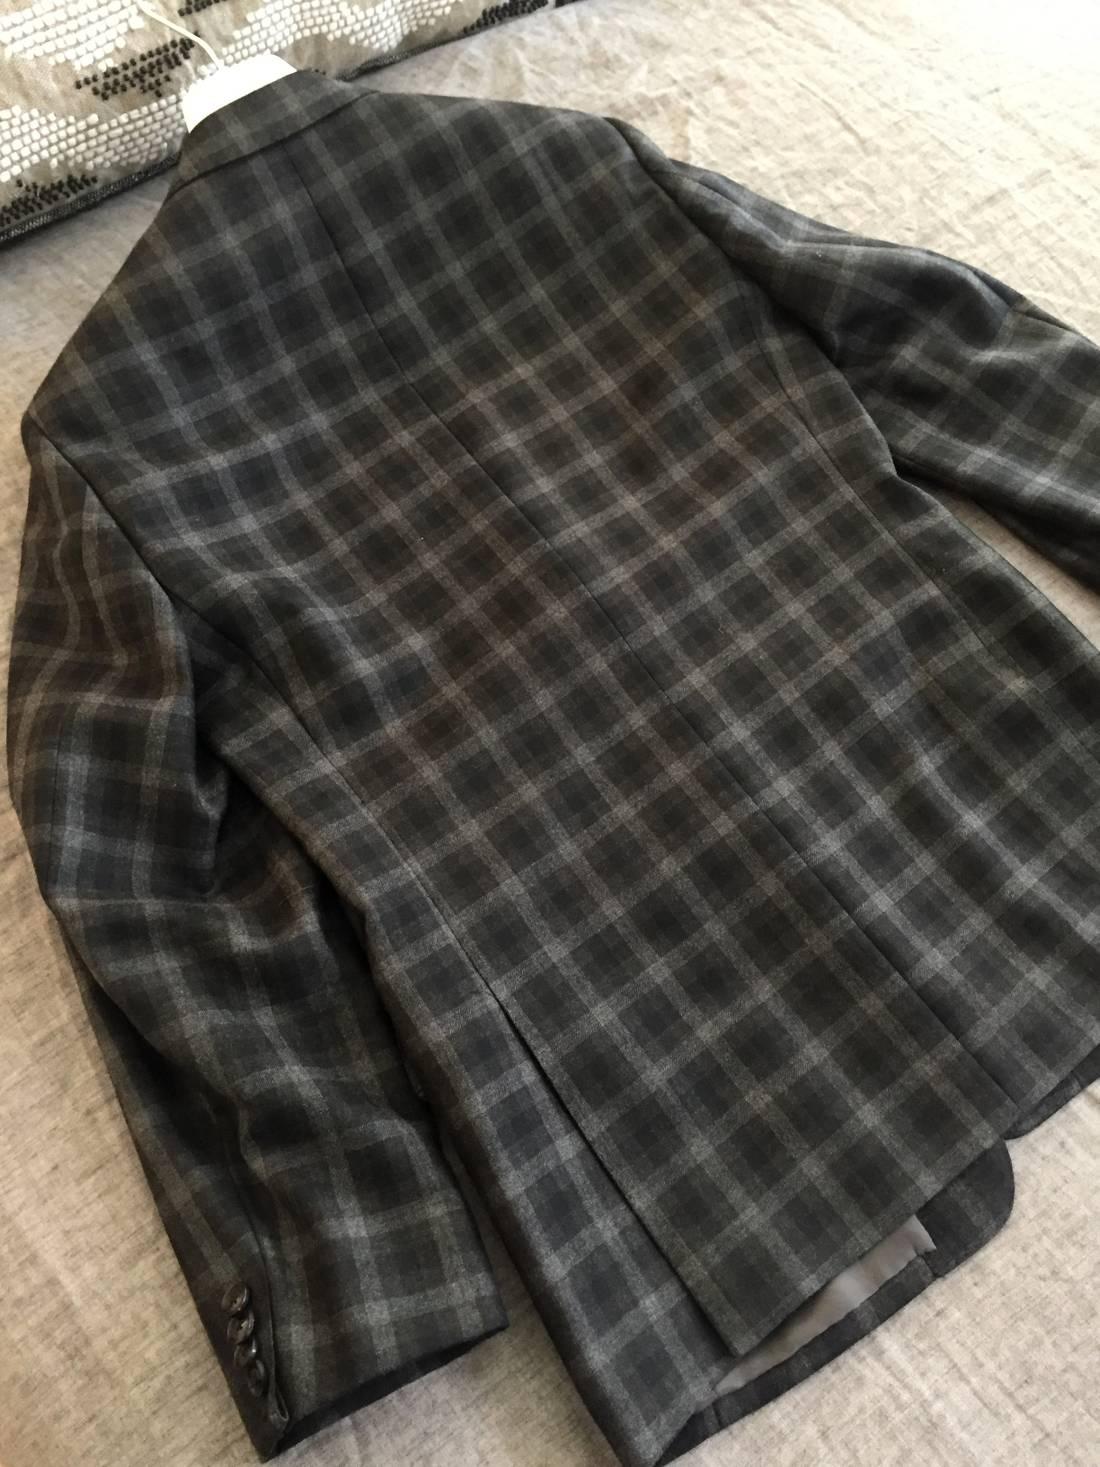 Elie Tahari 595 38 Jacket Blazer Sport Coat Tailored Glen Plaid Shirt